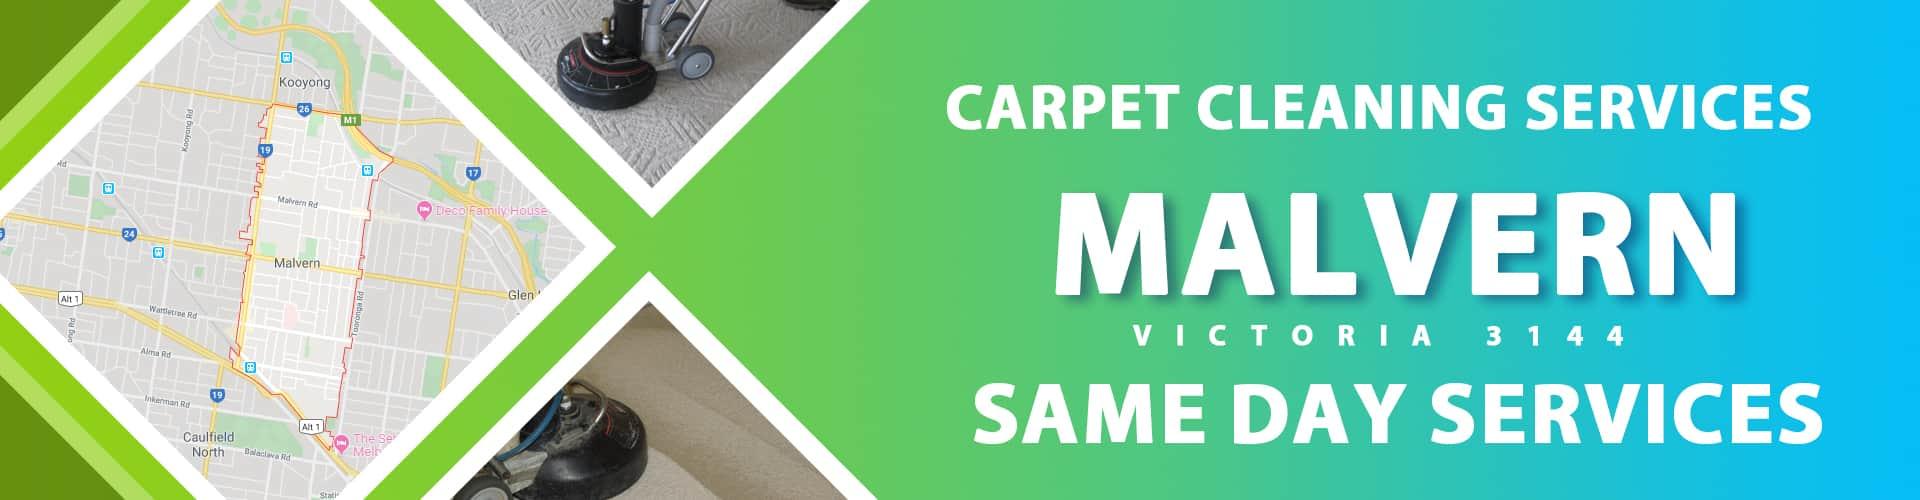 Carpet Cleaning Malvern